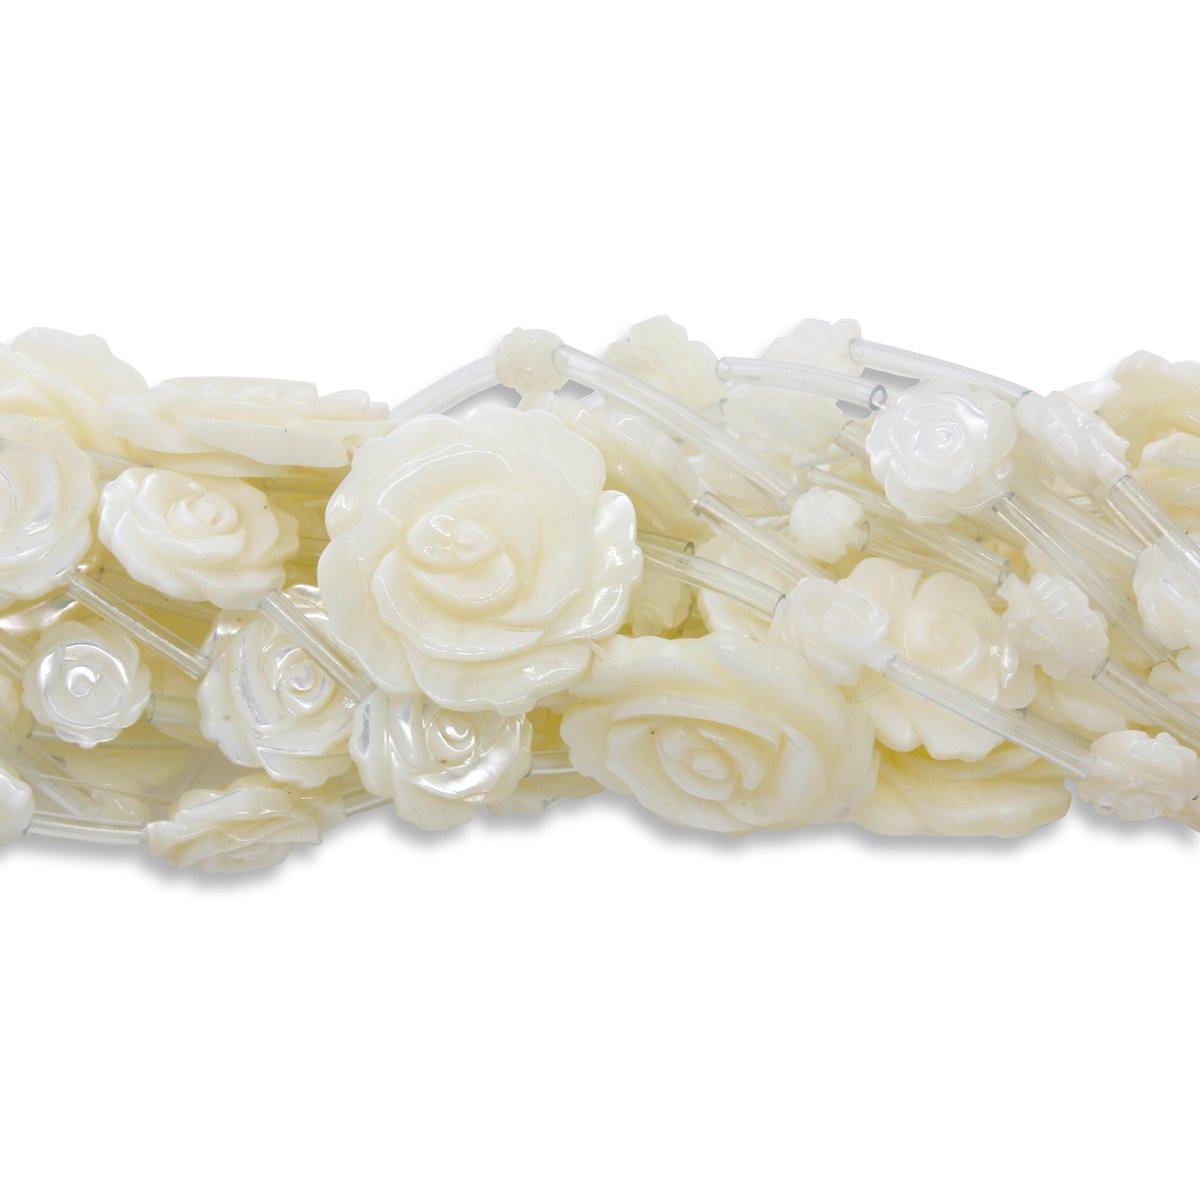 Natual White Shell Rose Beads Strand #whiteshell #rose #beads #jewelry #jewellery #accessories #jowele #beadsstrand #jewelrymaking #decorations #whiterose #jewelryshop #fashion #style #art #craft #jewelrycraft